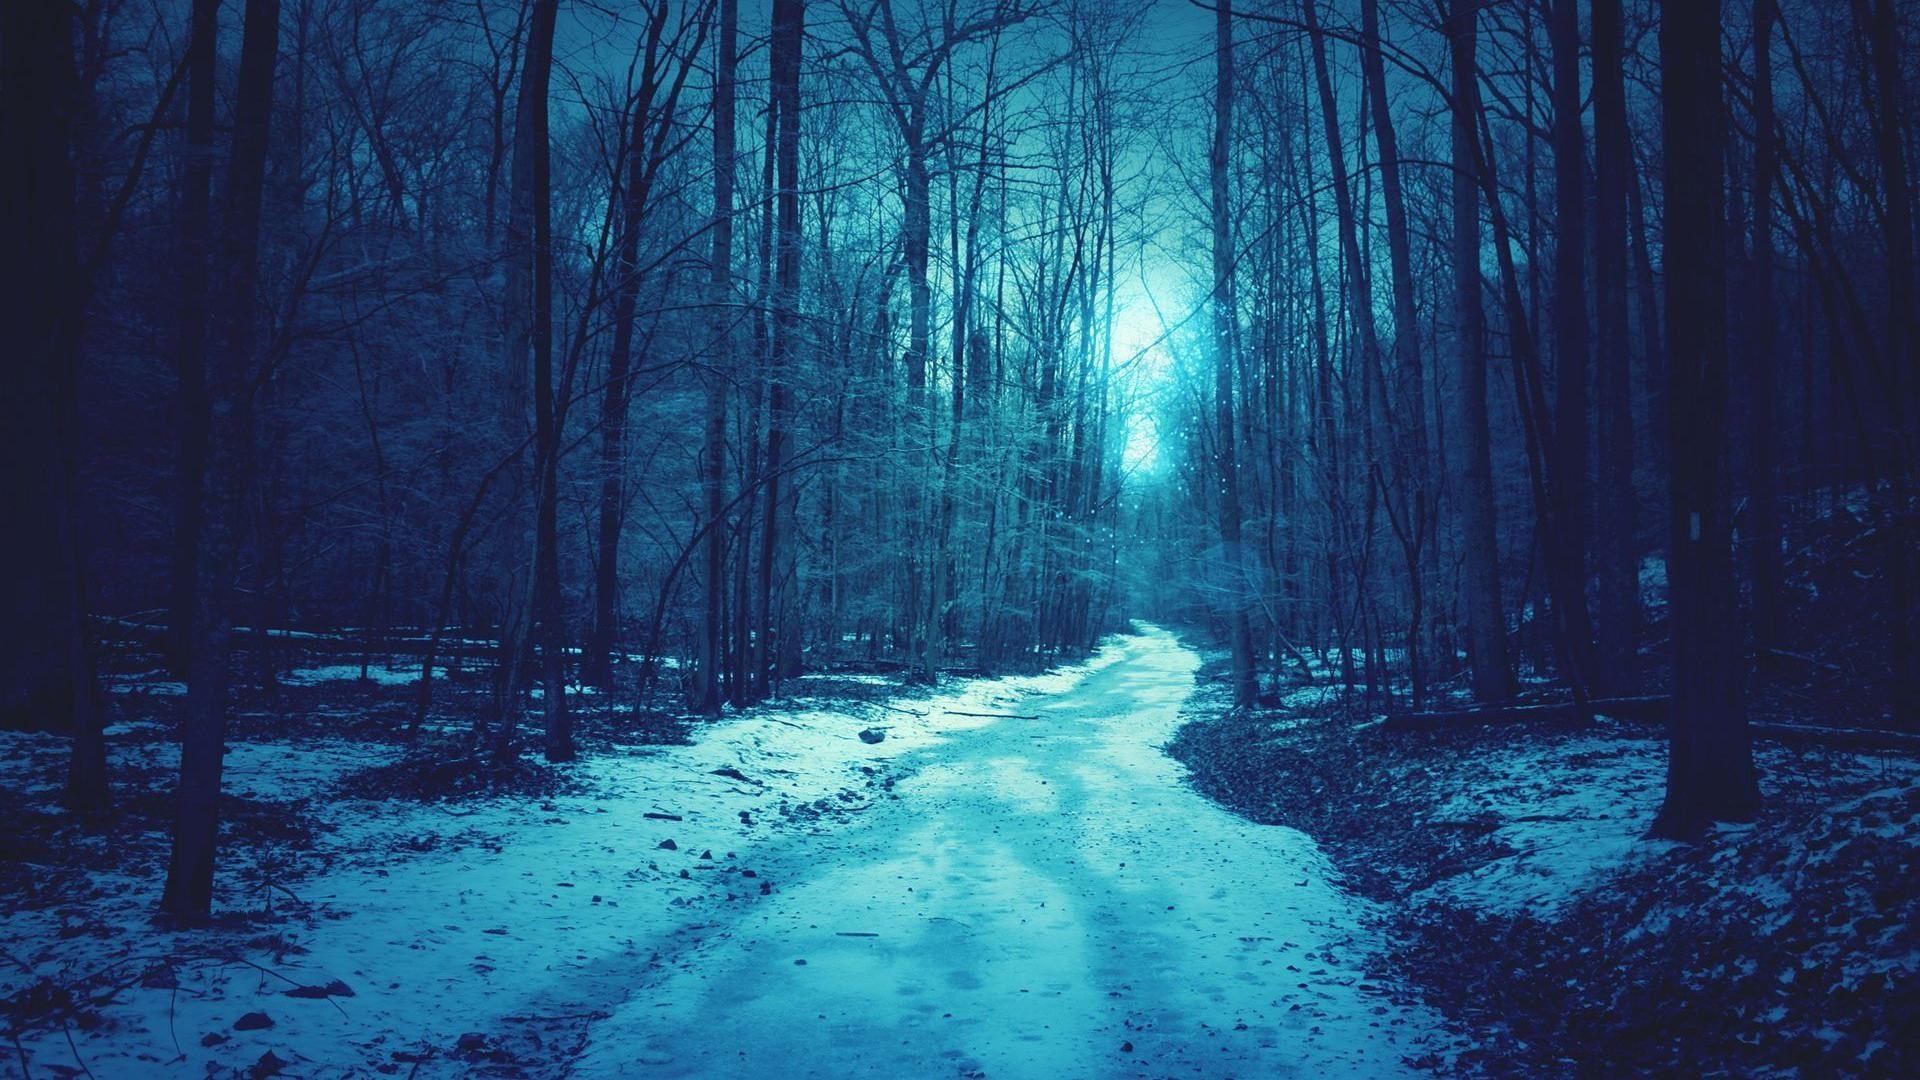 backgrounds, winter, shallow, blue, background, forest, snow, desktop .